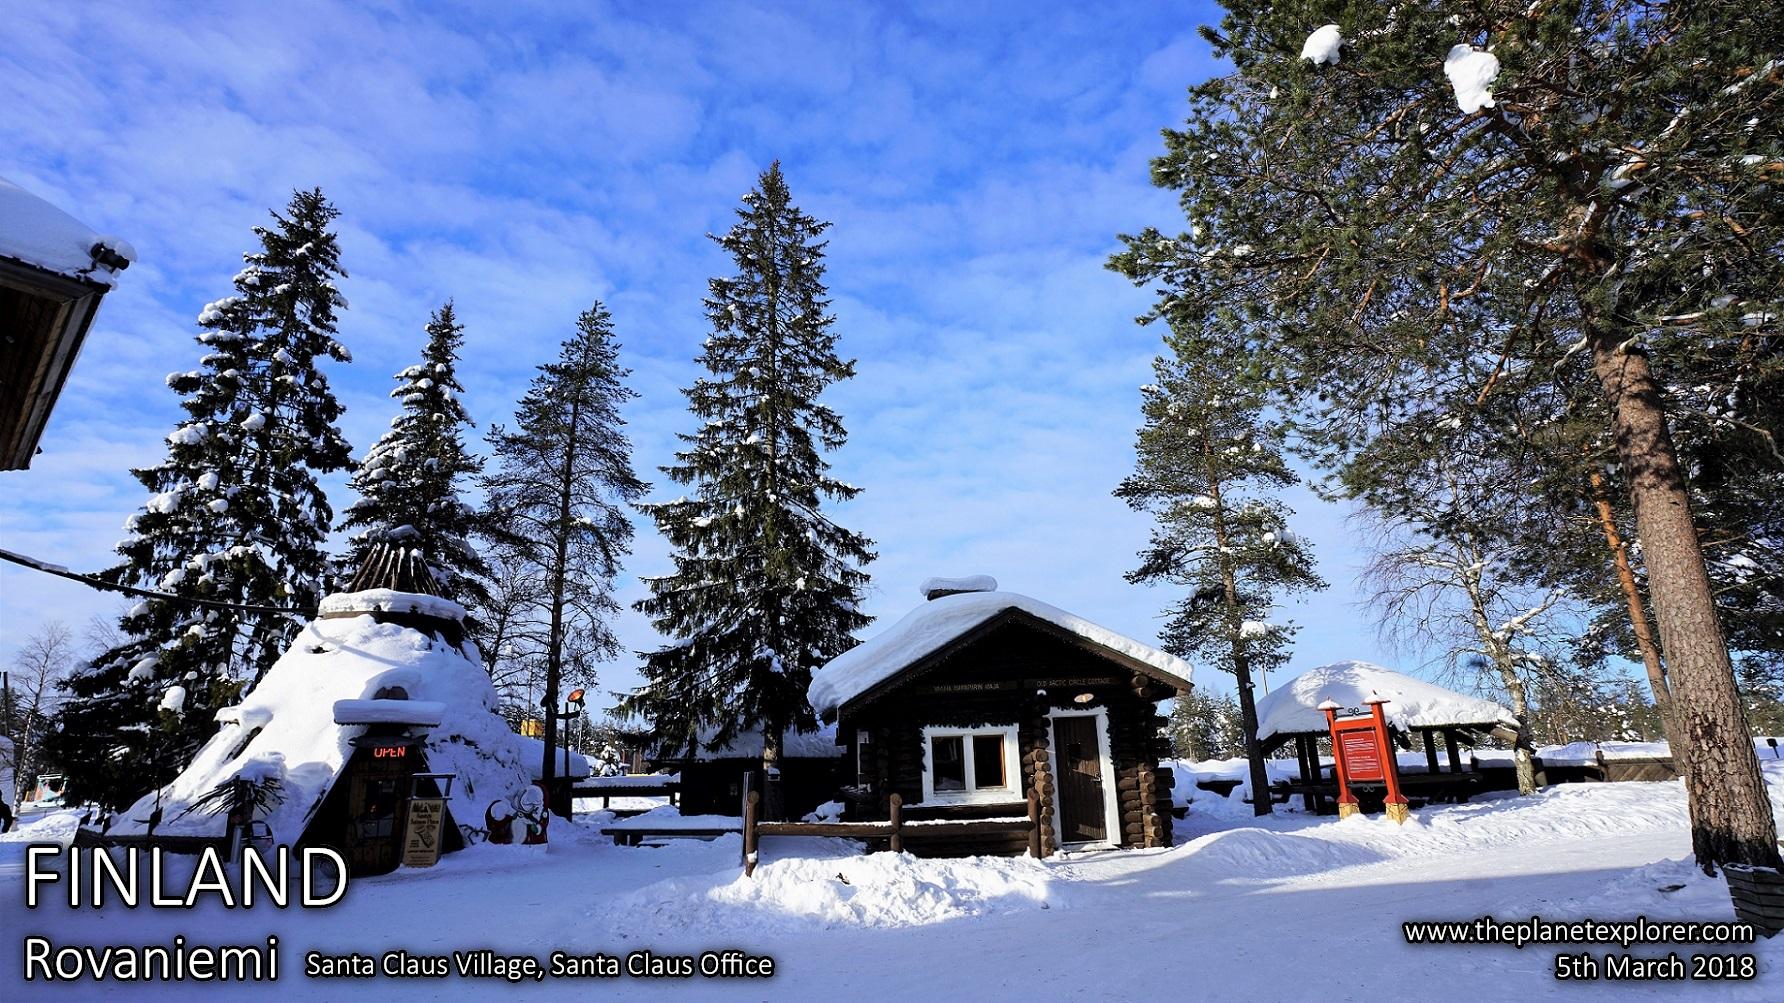 20180305_1437_Finland_Rovaniemi_Santa Claus Village_DSC09553_Sony a7R2_LR_@www